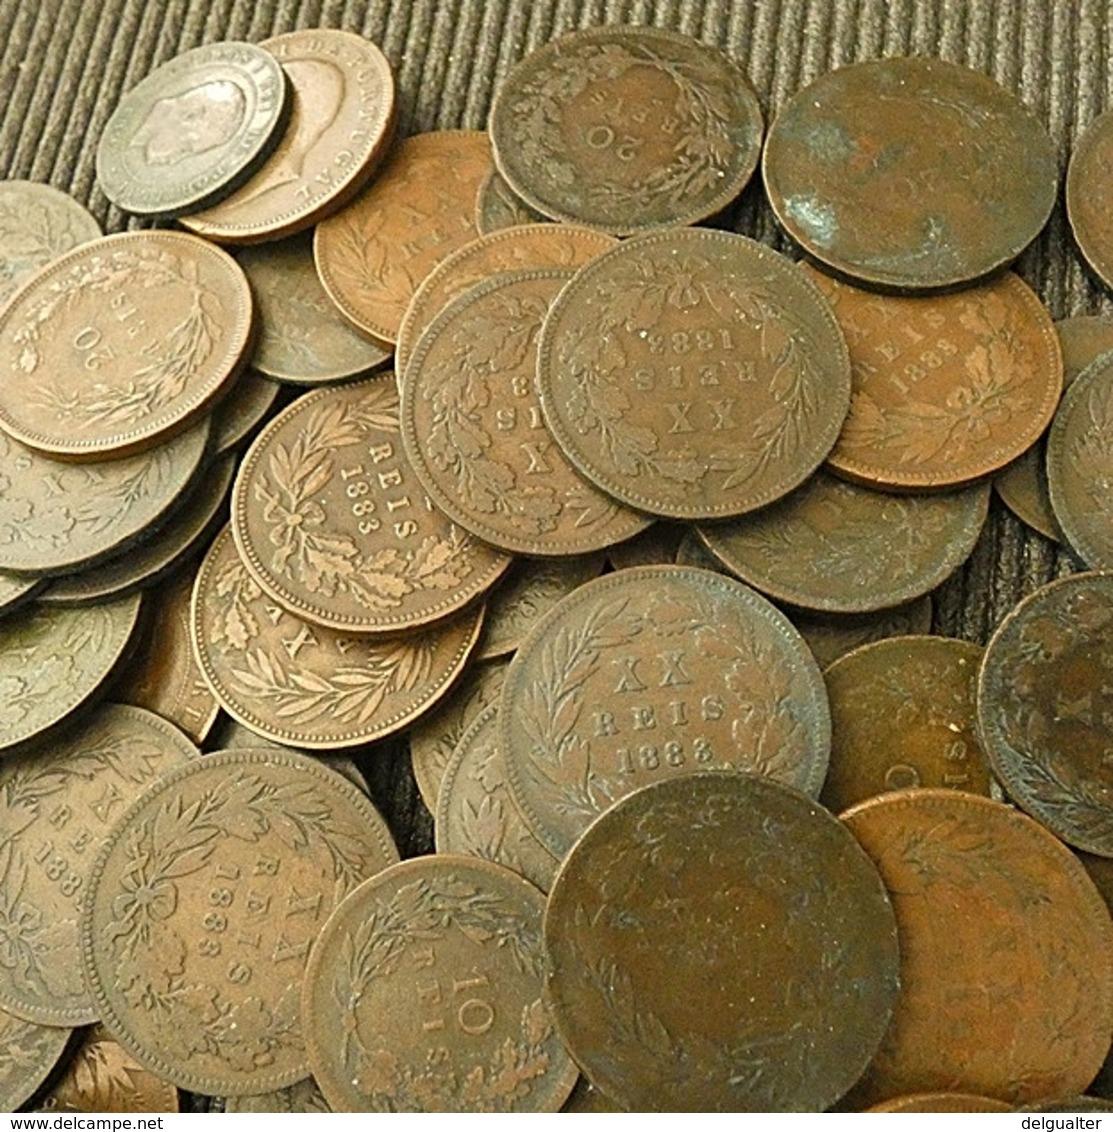 Lot 103 Coins Portuguese 10 And 20 Reis D. Luiz And D. Carlos - Kilowaar - Munten